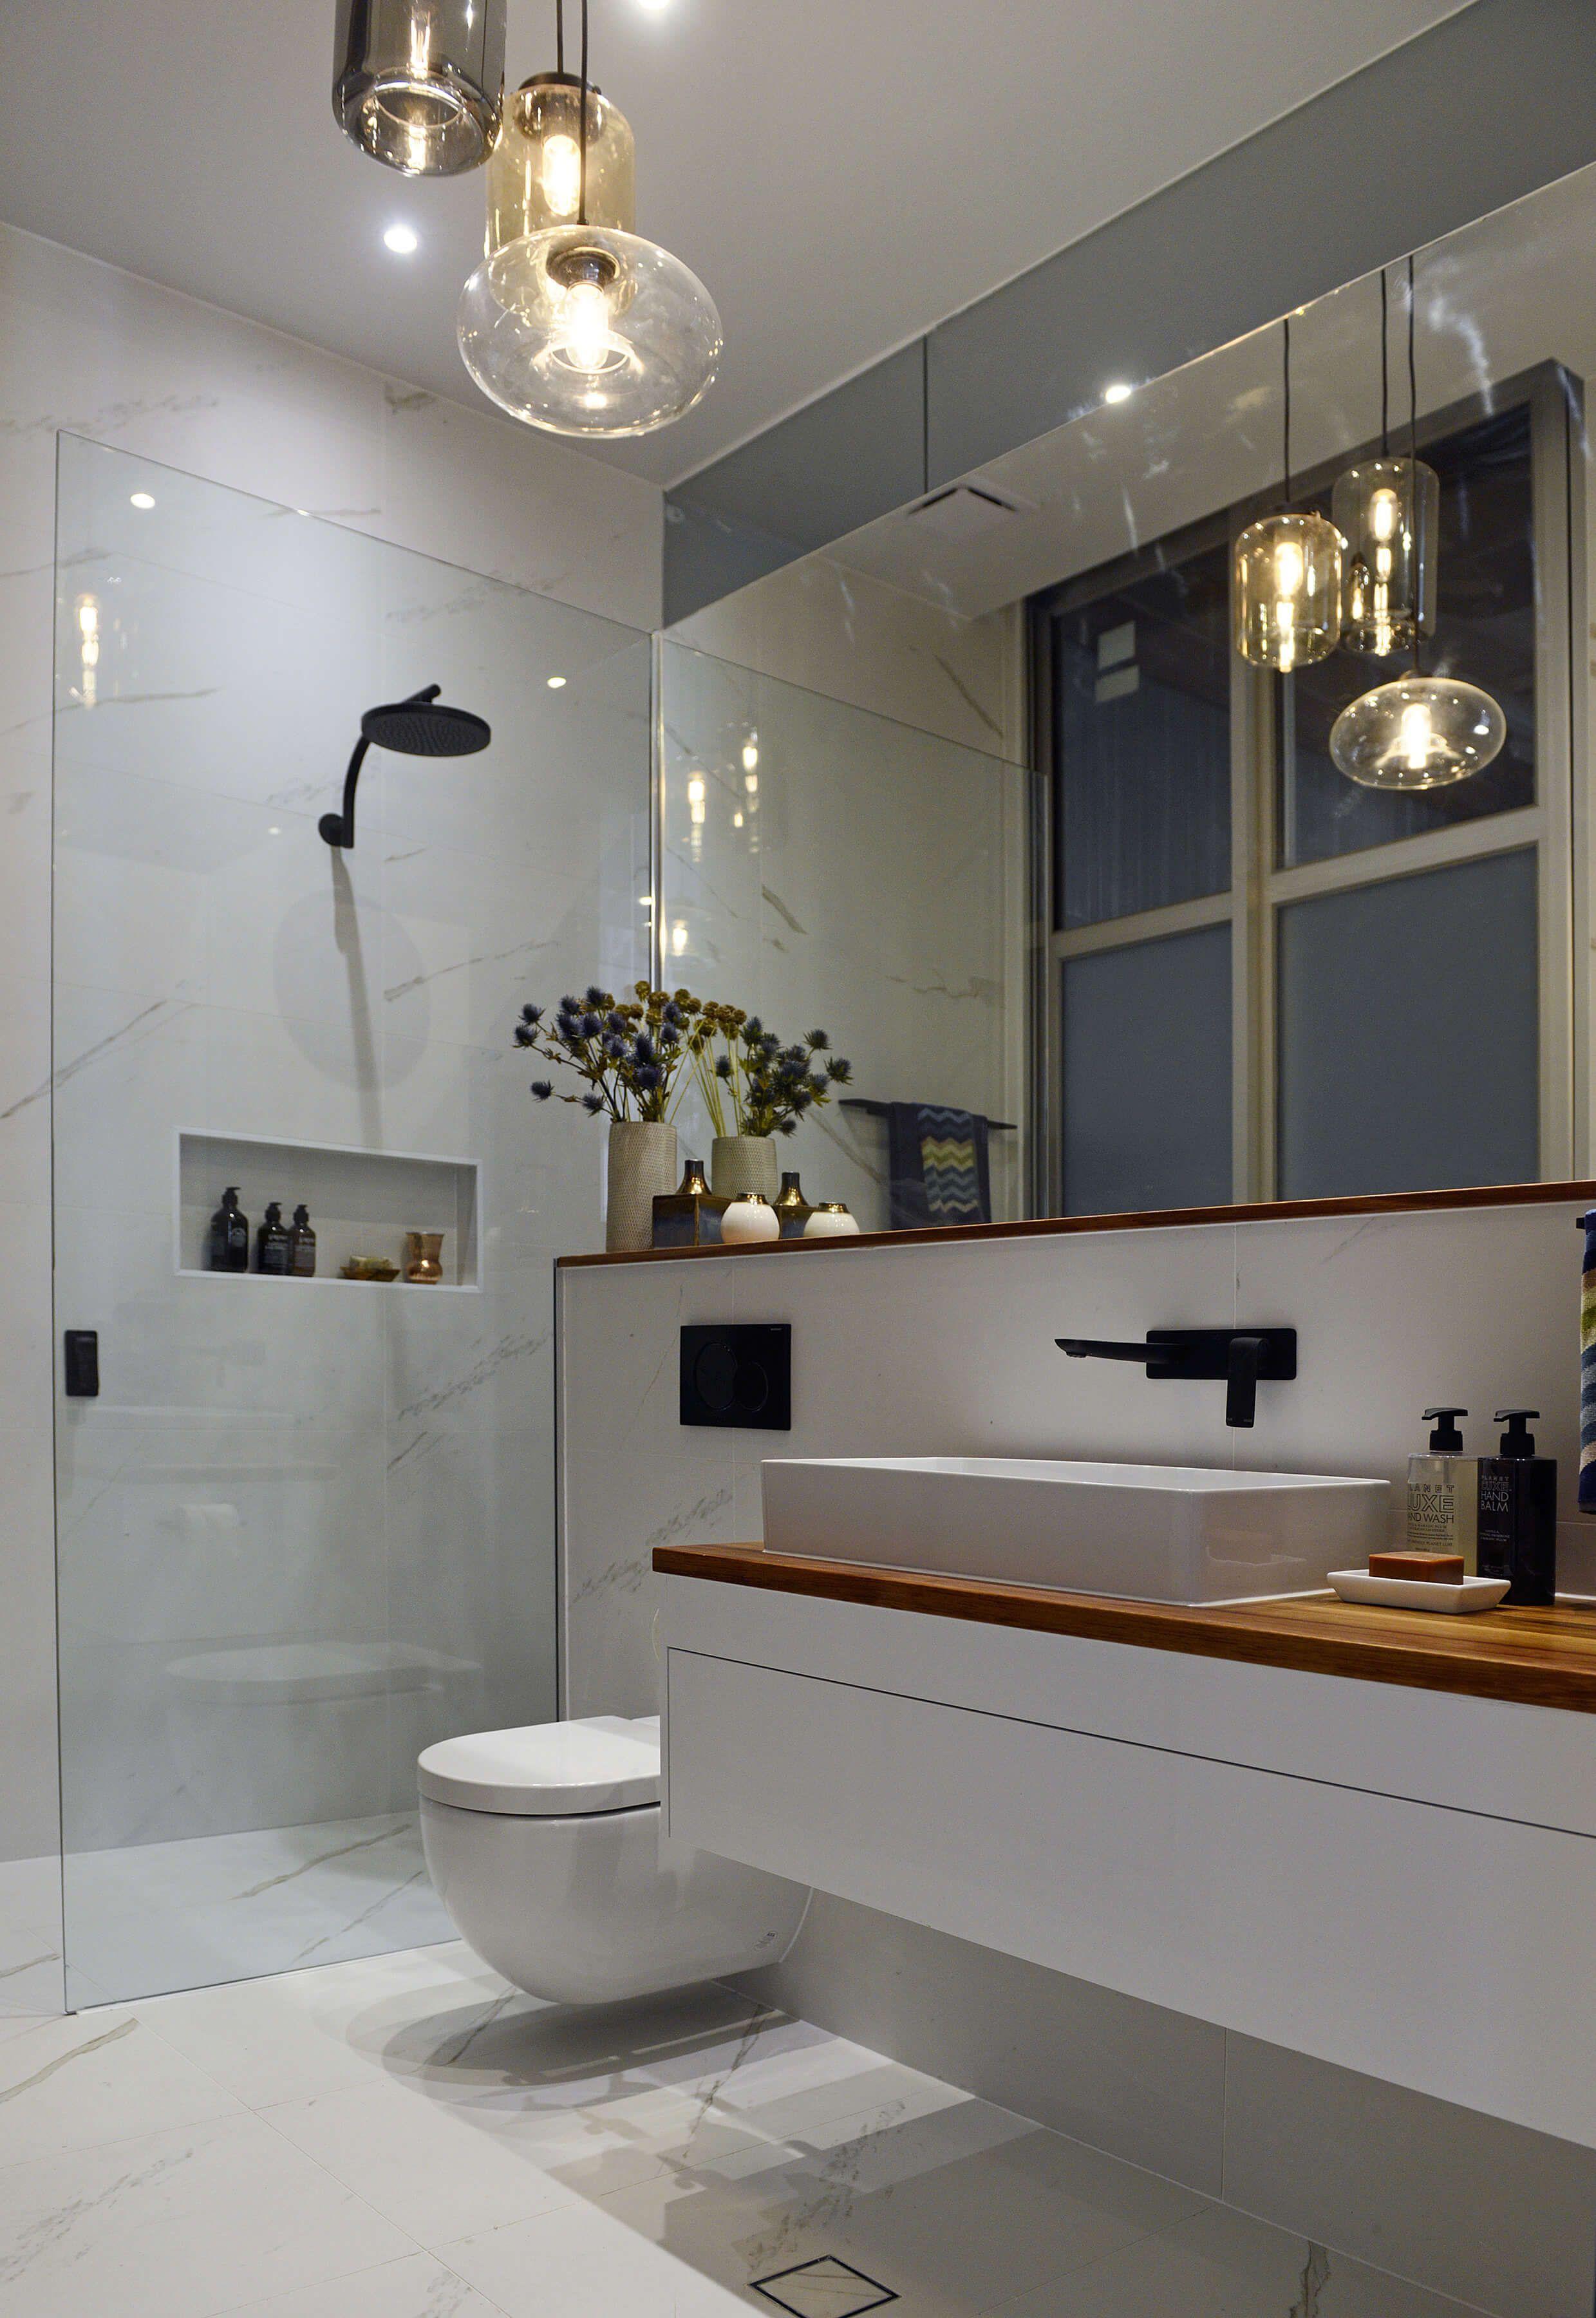 Master bedroom ensuite ideas  The Block Glasshouse Ensuite week  Bathrooms OS  Pinterest